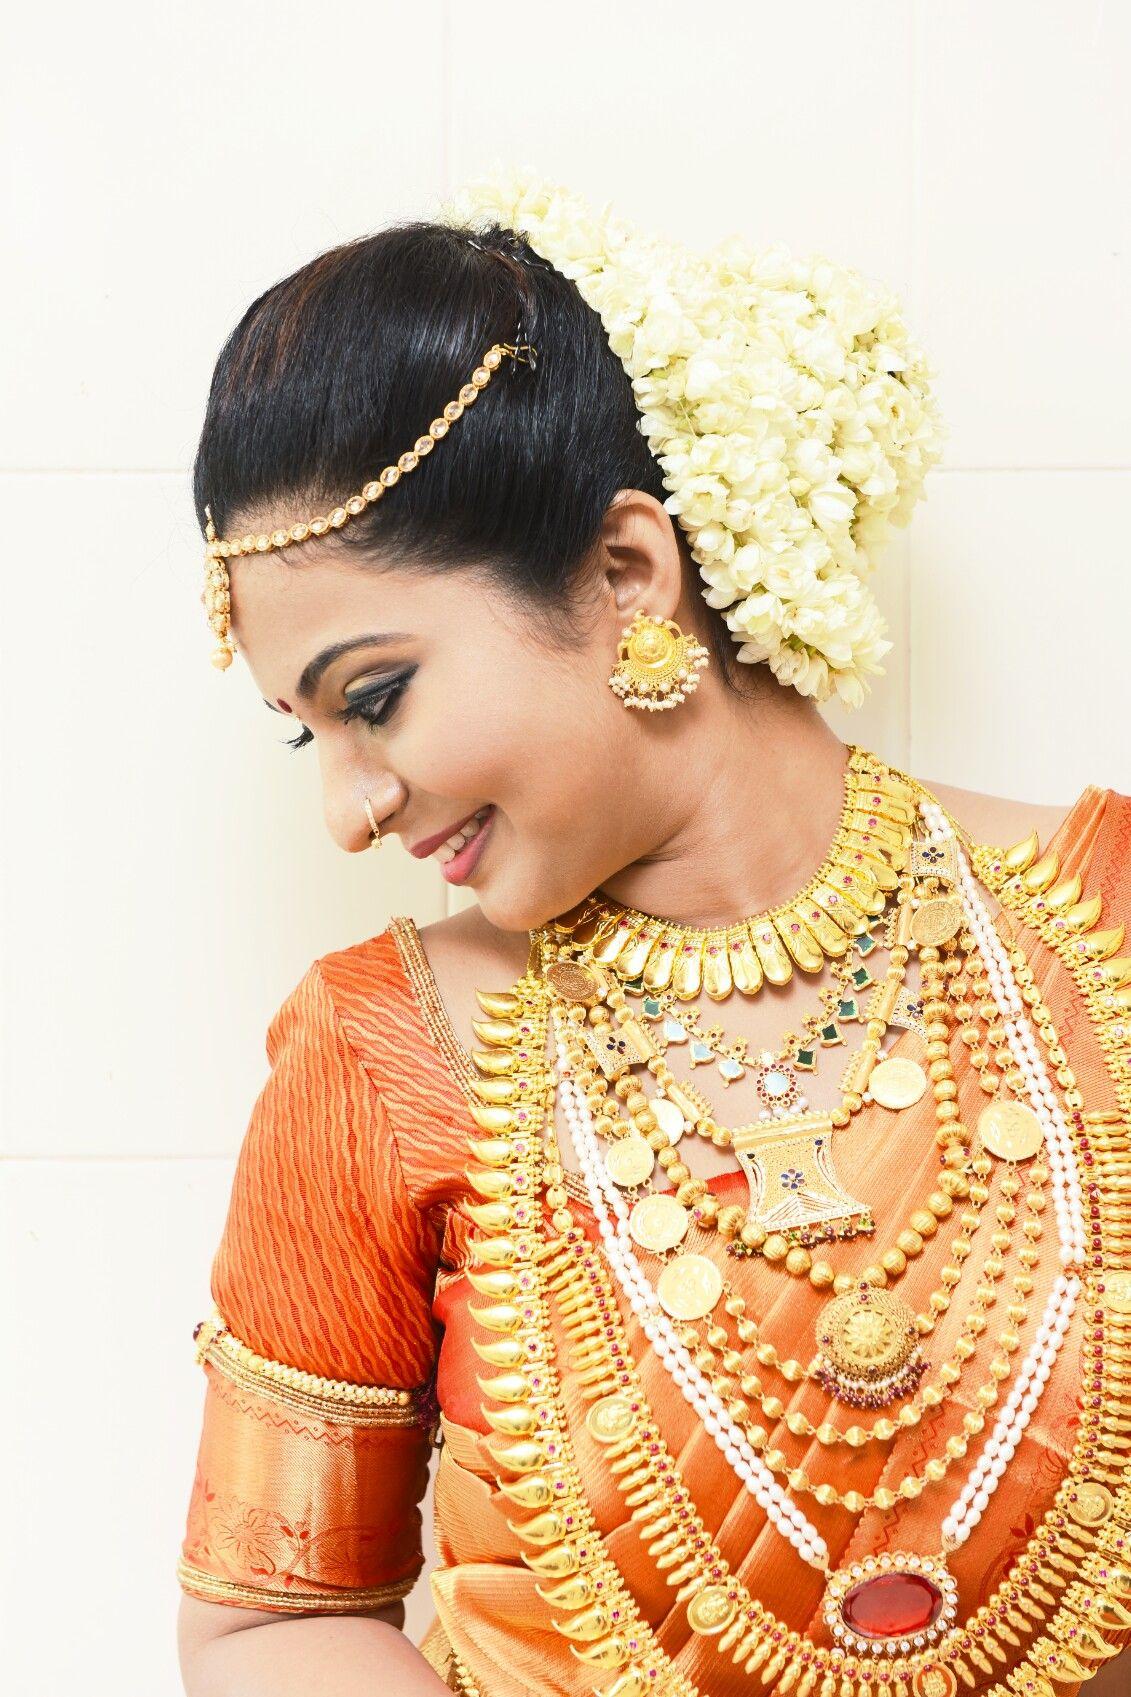 hindu bride, nose stud, kerala traditional jewellary, orange